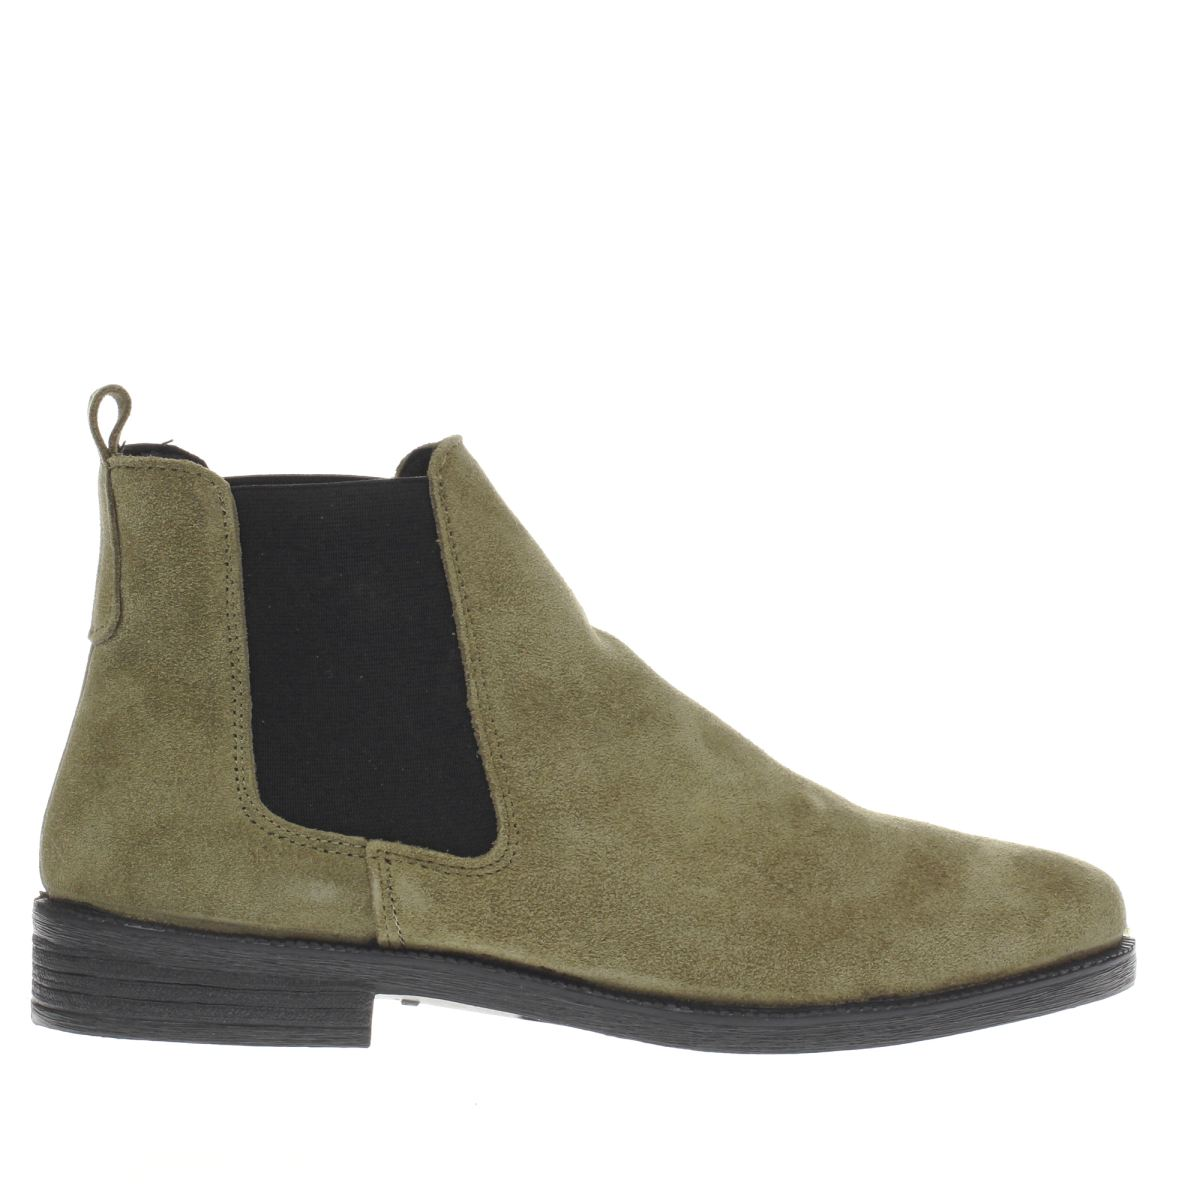 schuh khaki prompt boots